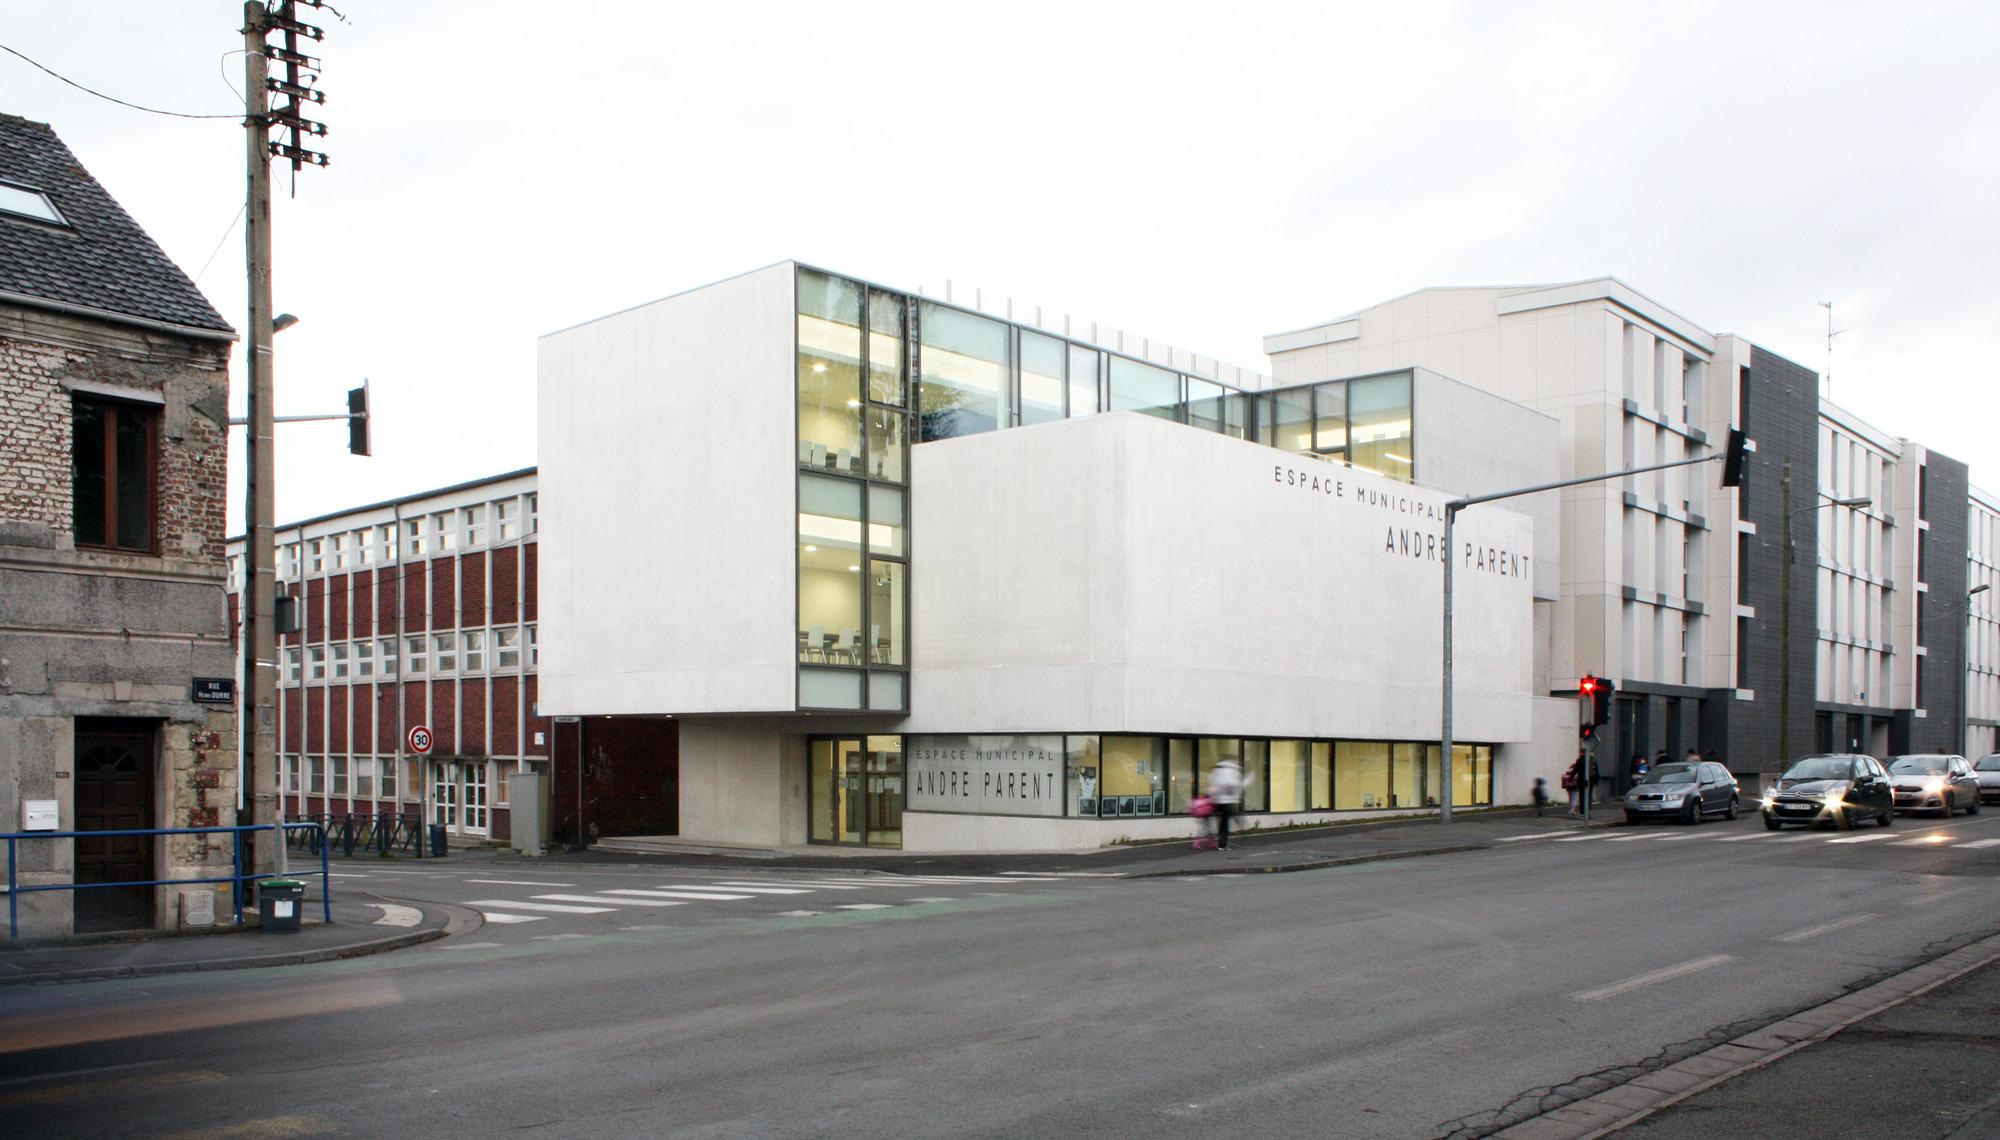 Andr parent cultural center olivier werner architecte for Parent architecte